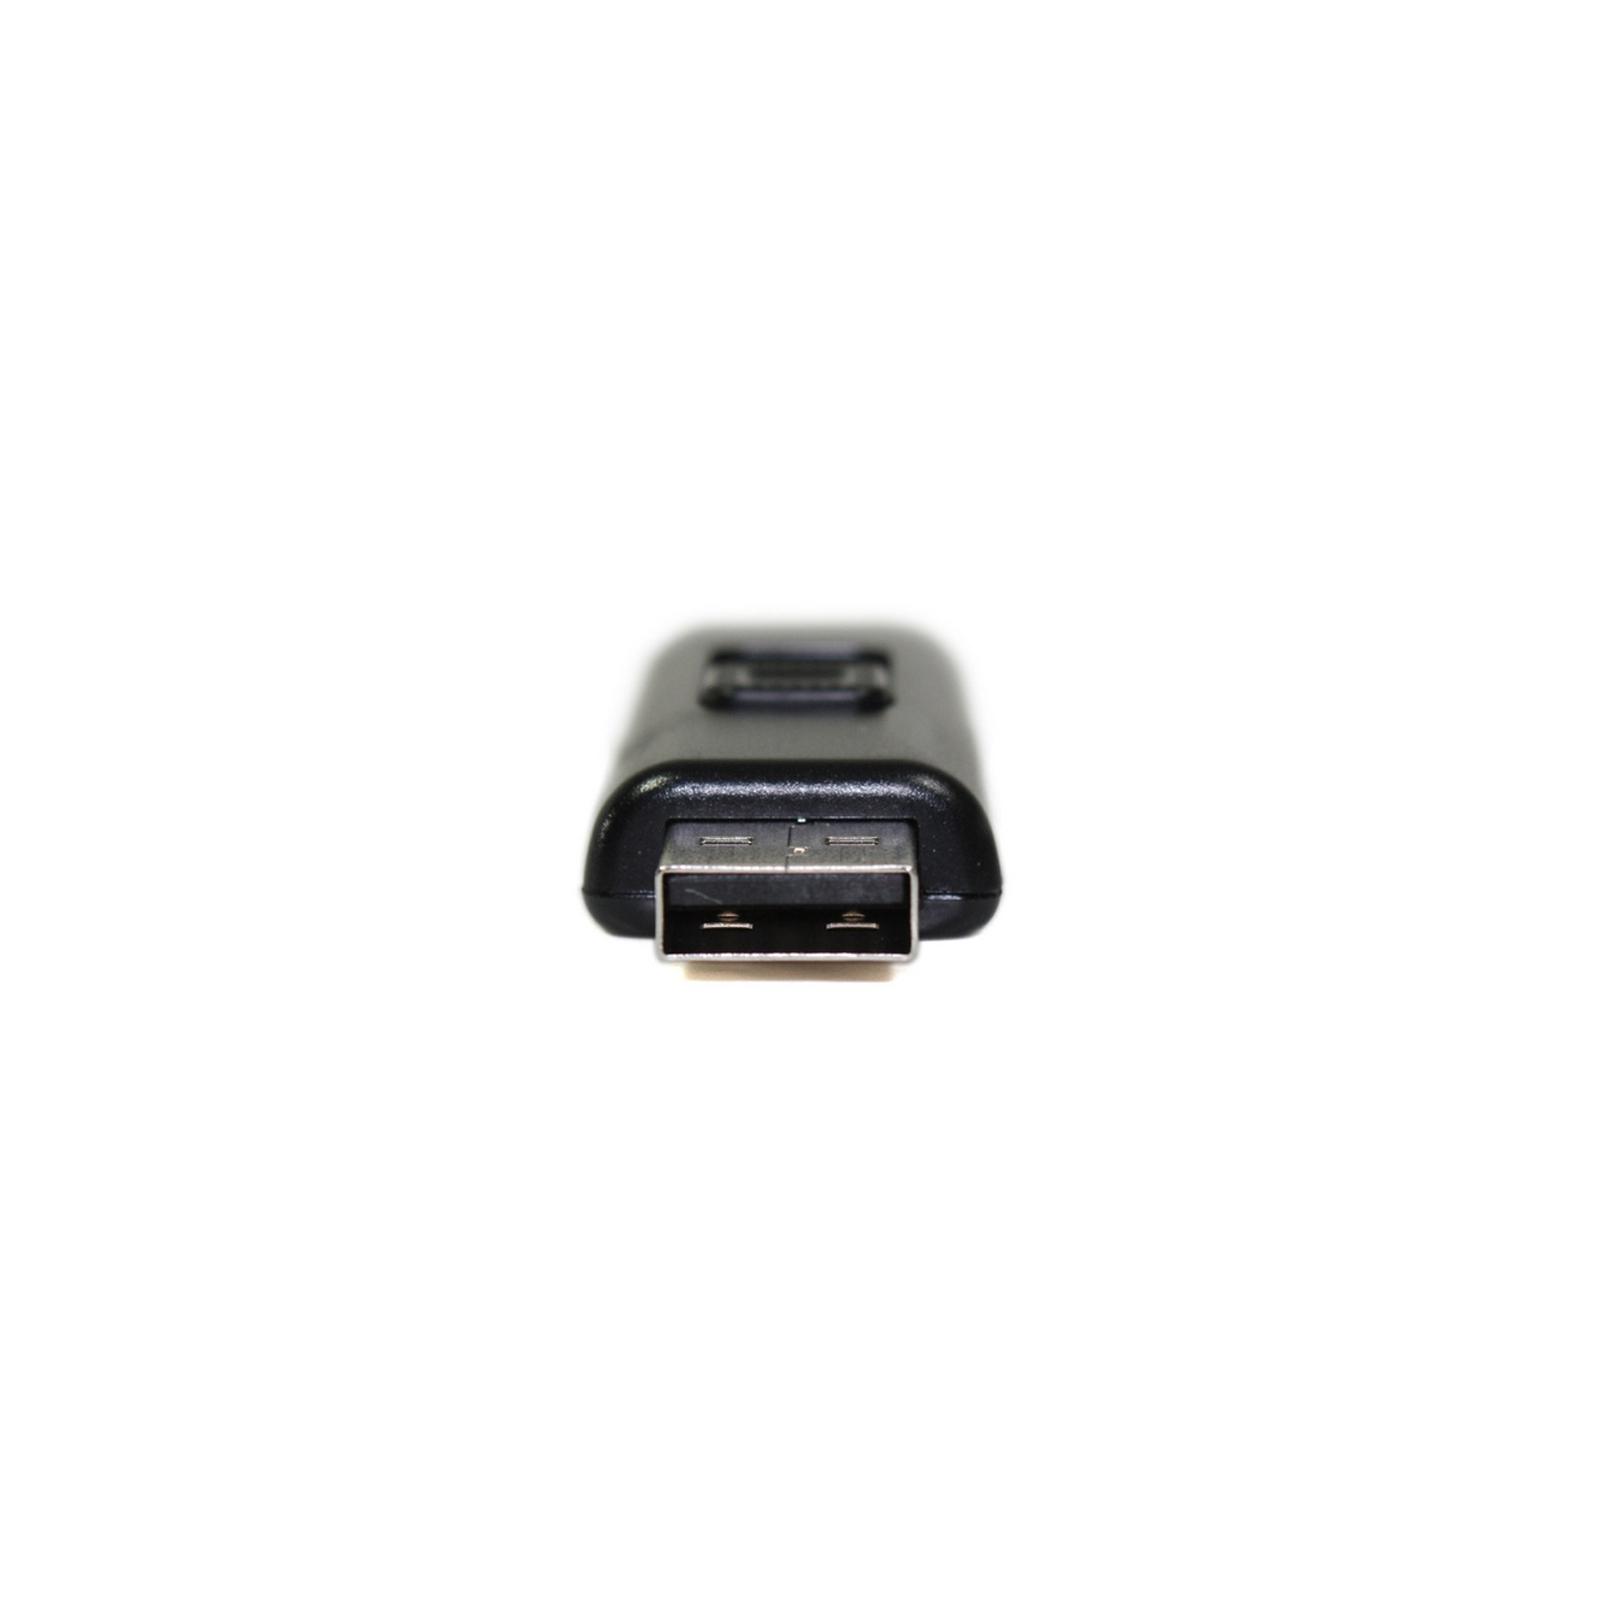 USB флеш накопитель 32GB AH325 Black RP USB2.0 Apacer (AP32GAH325B-1) изображение 7